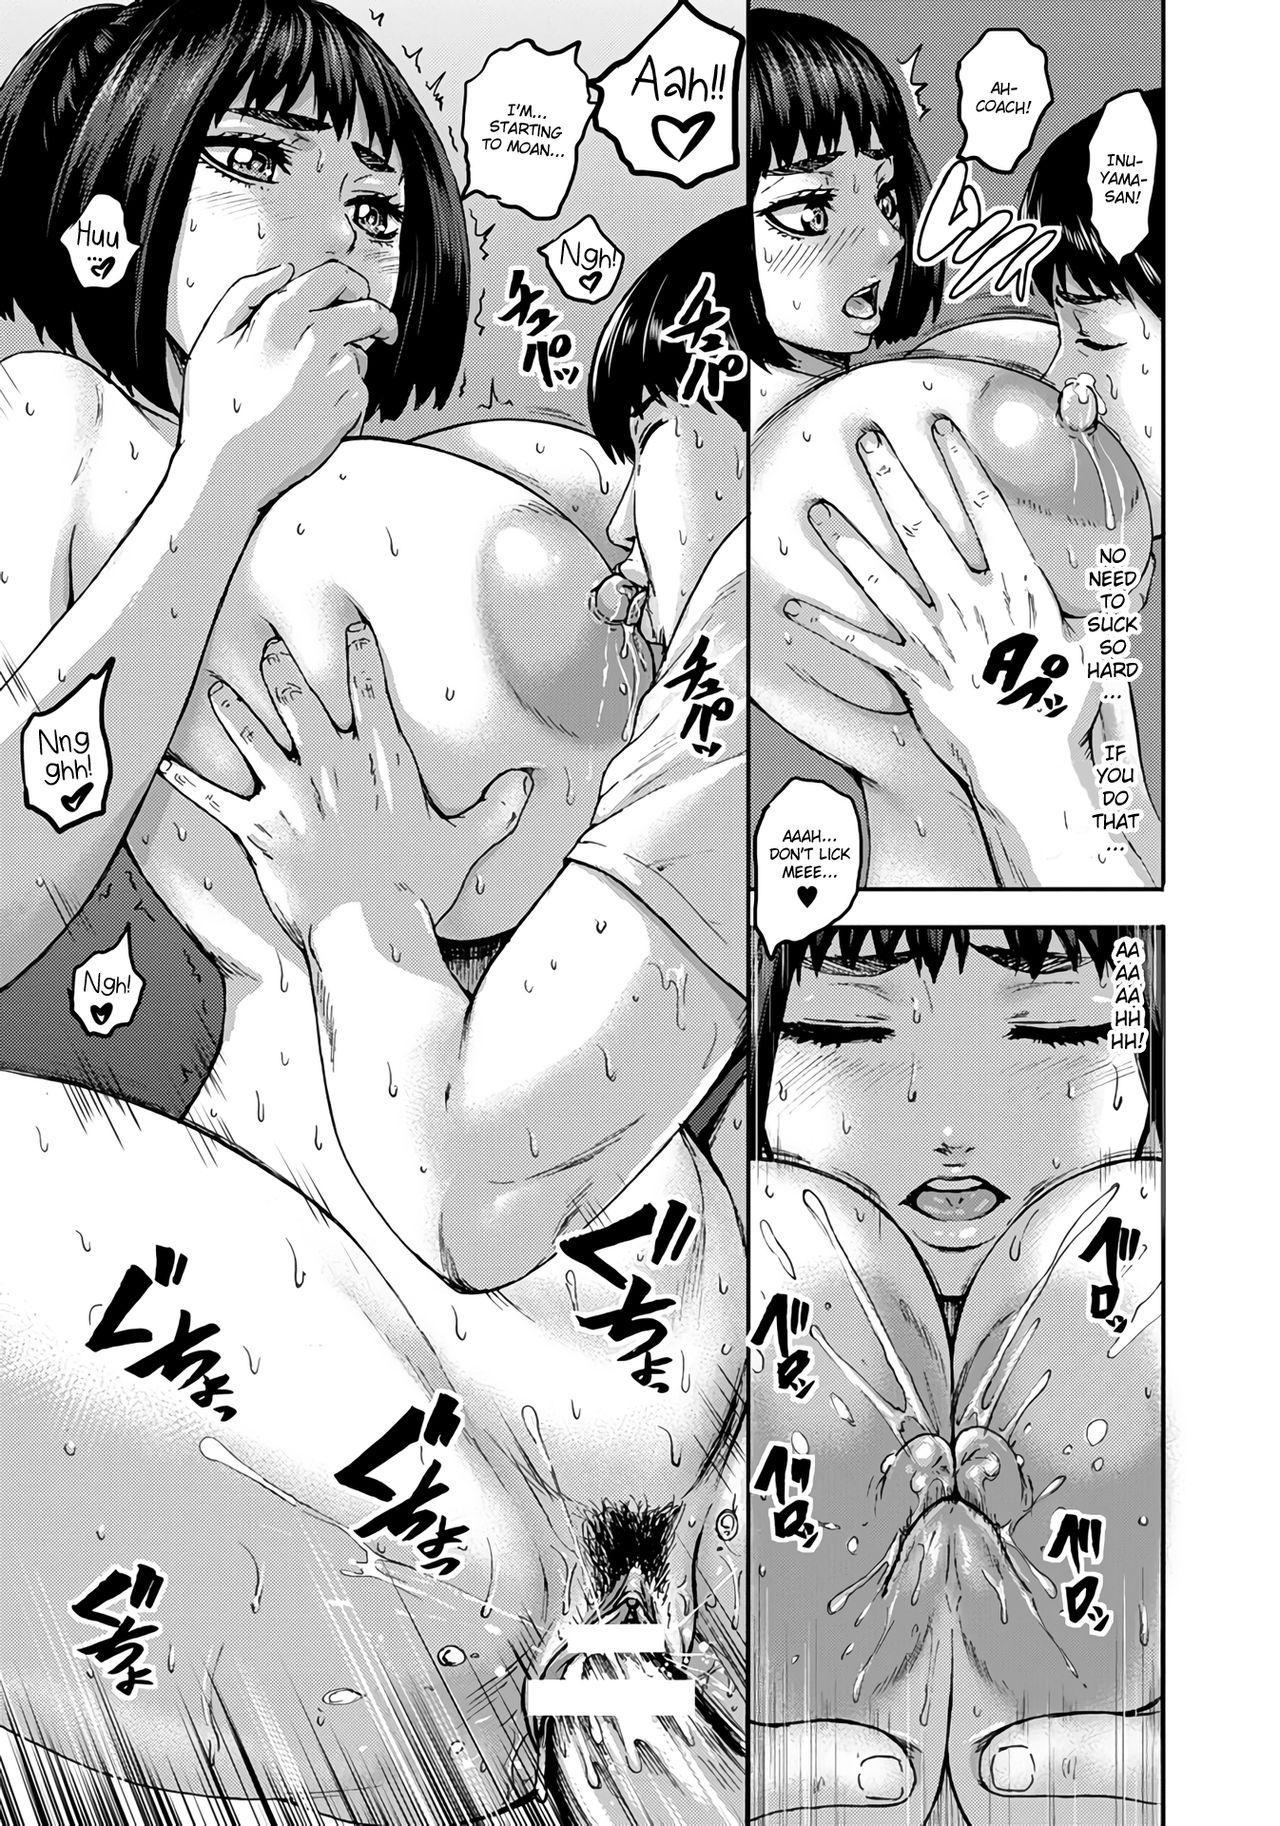 Chounyuu Gakuen | Academy For Huge Breasts Ch. 1-3 18